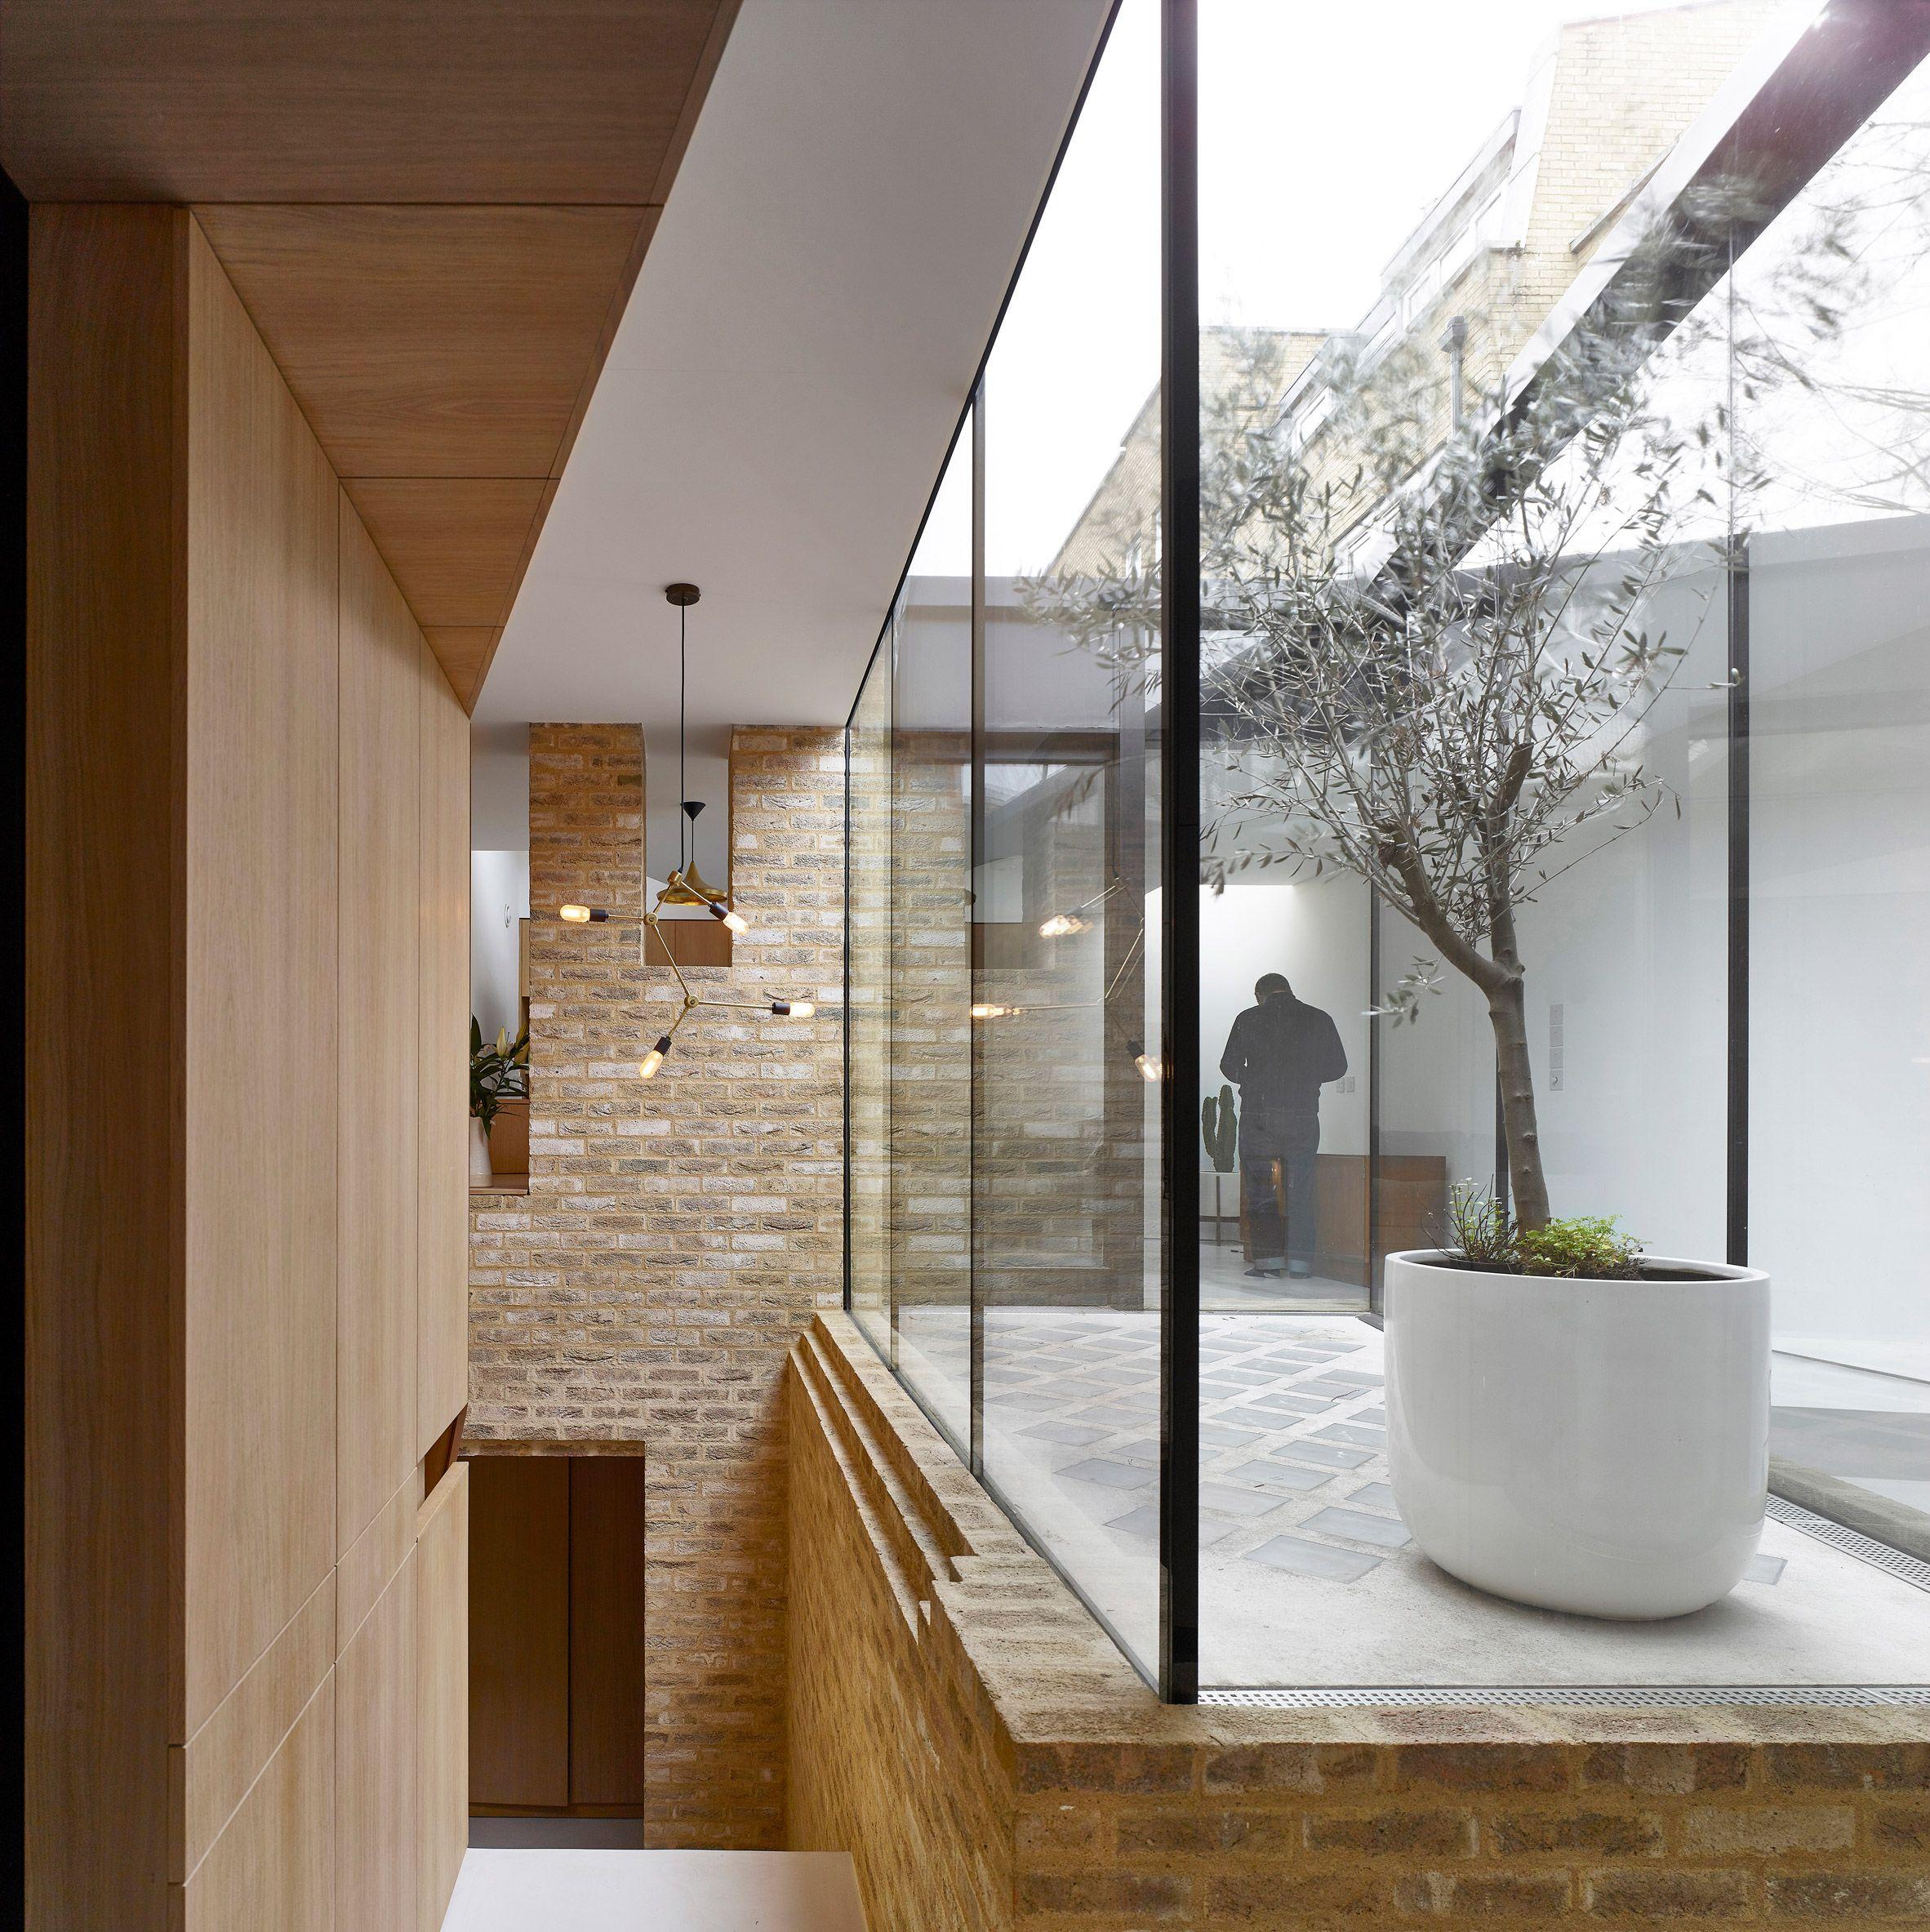 Hayhurst Uses Glazed Atrium To Illuminate Interior Of